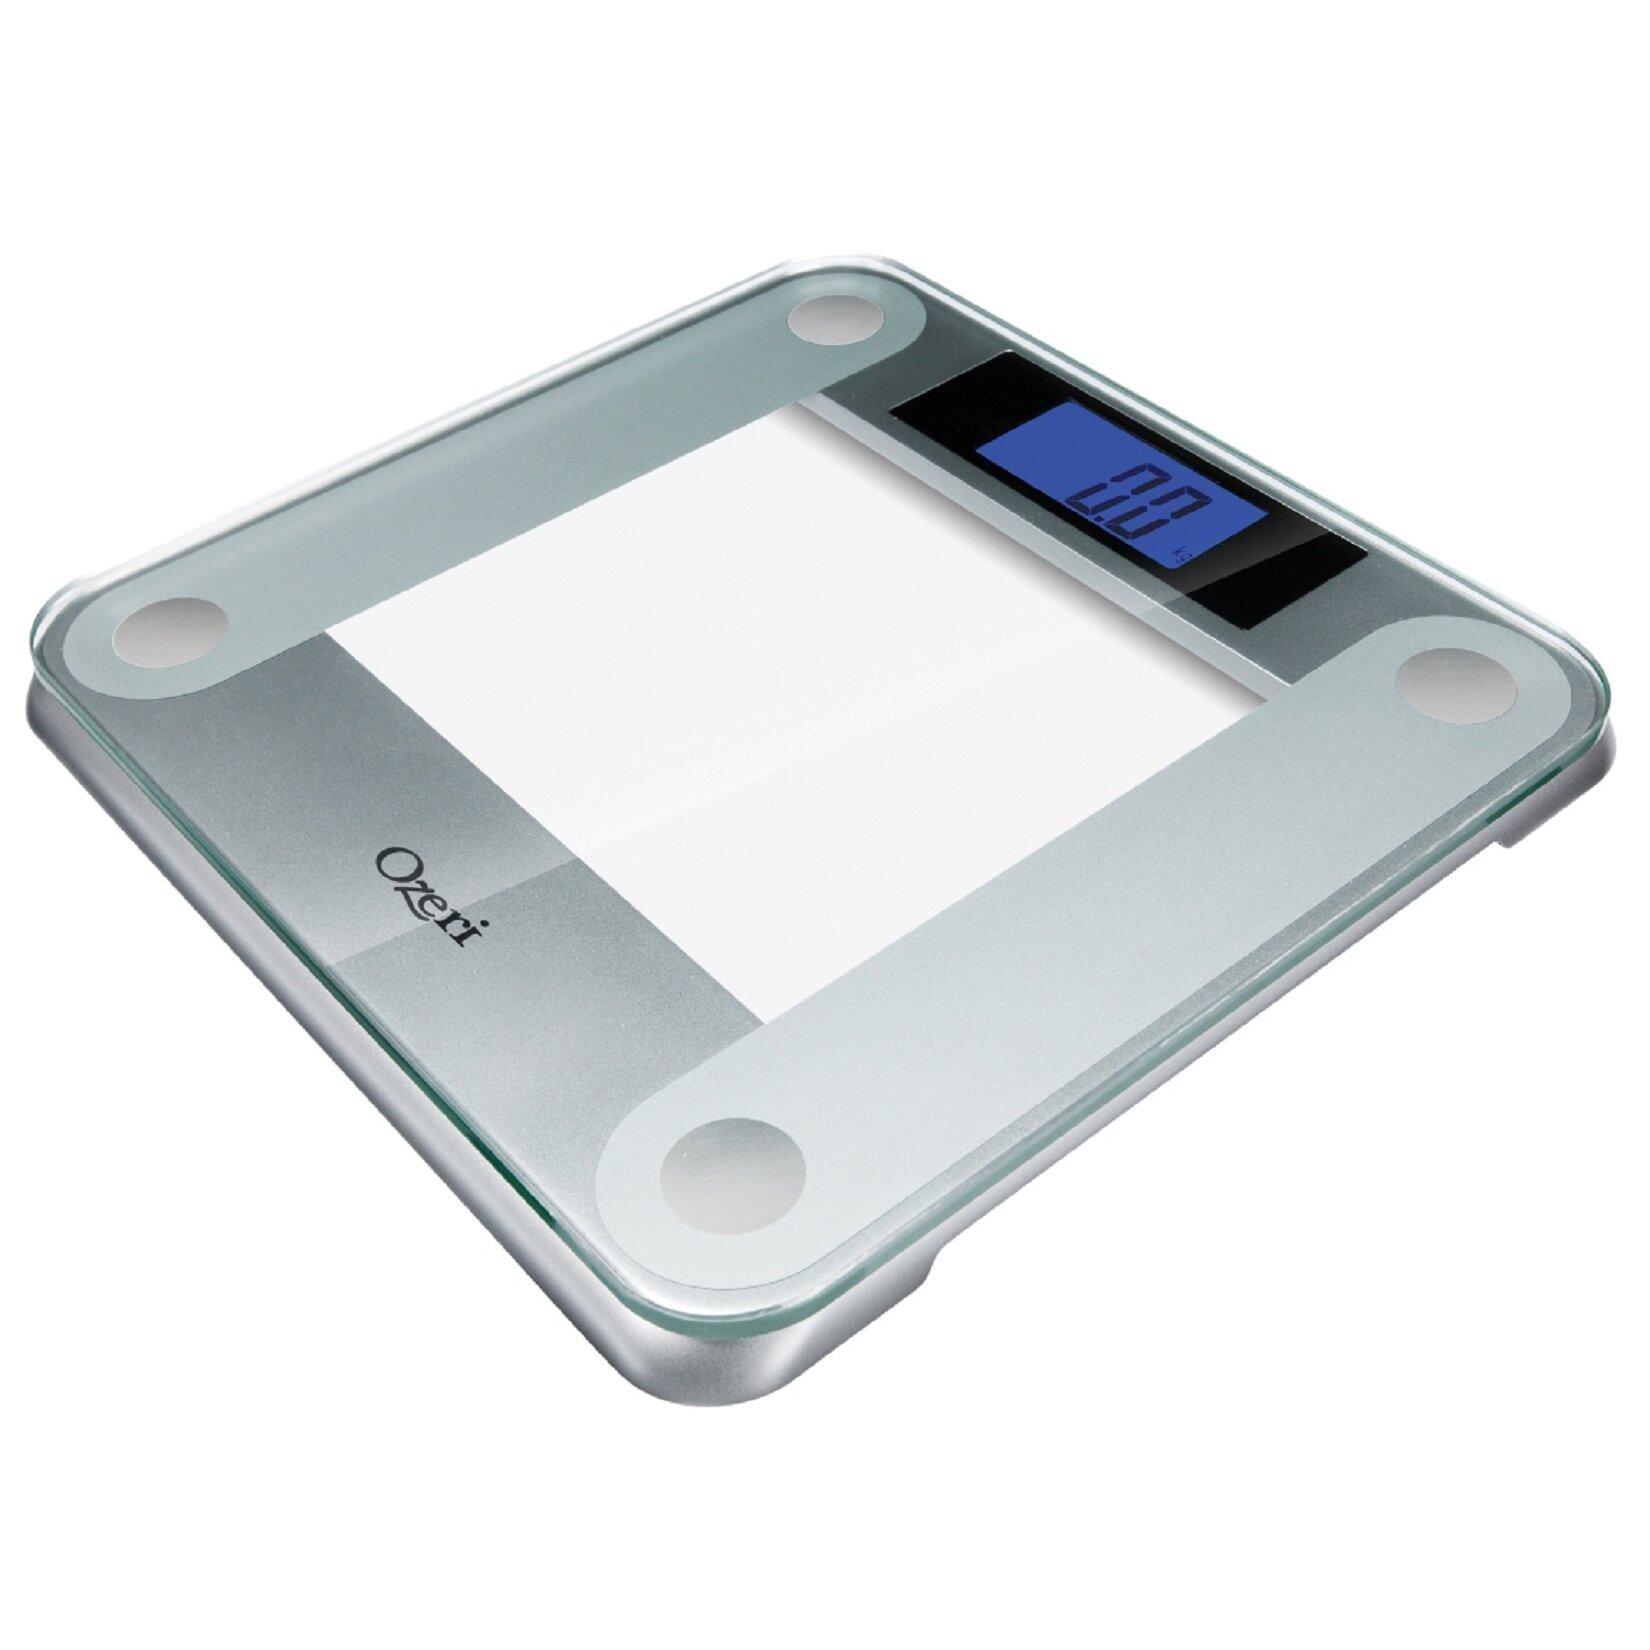 Ozeri Precision II Digital Bathroom Scale  440 lbs Capacity   with Weight Change Detection. Ozeri Precision II Digital Bathroom Scale  440 lbs Capacity   with